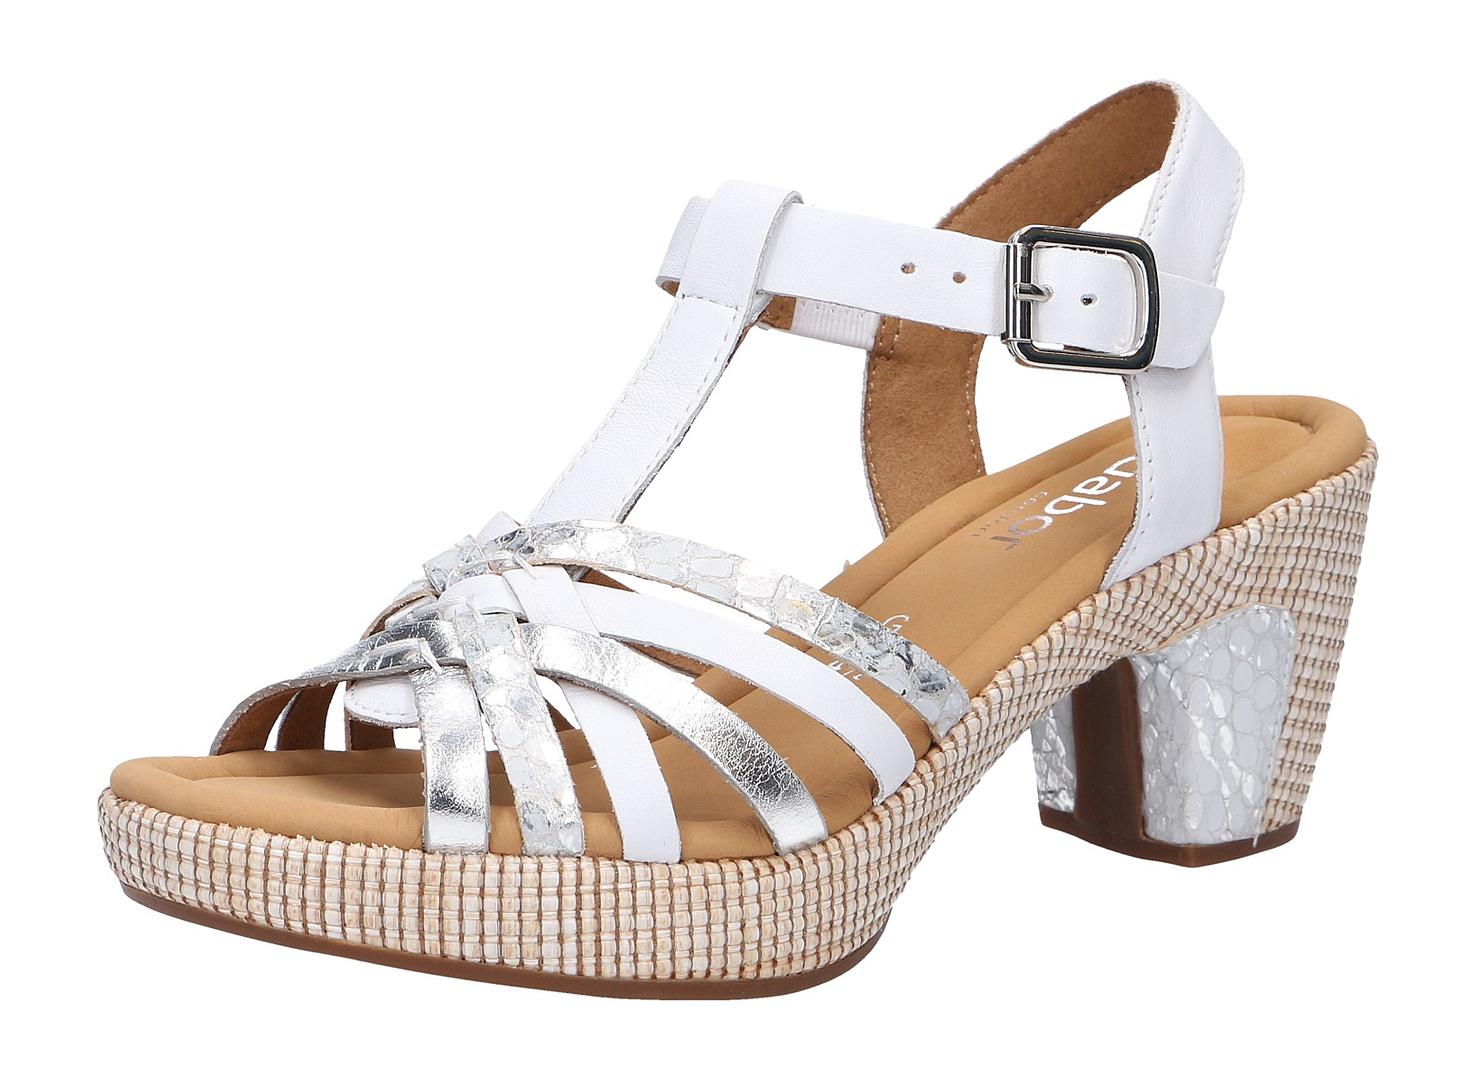 6f01d0a0ba3f Gabor 82.736.51   Komfort-Sandalen   SANDALEN   SANDALETTEN   DAMEN    ANGEBOTE   Dufner-Schuhe.de